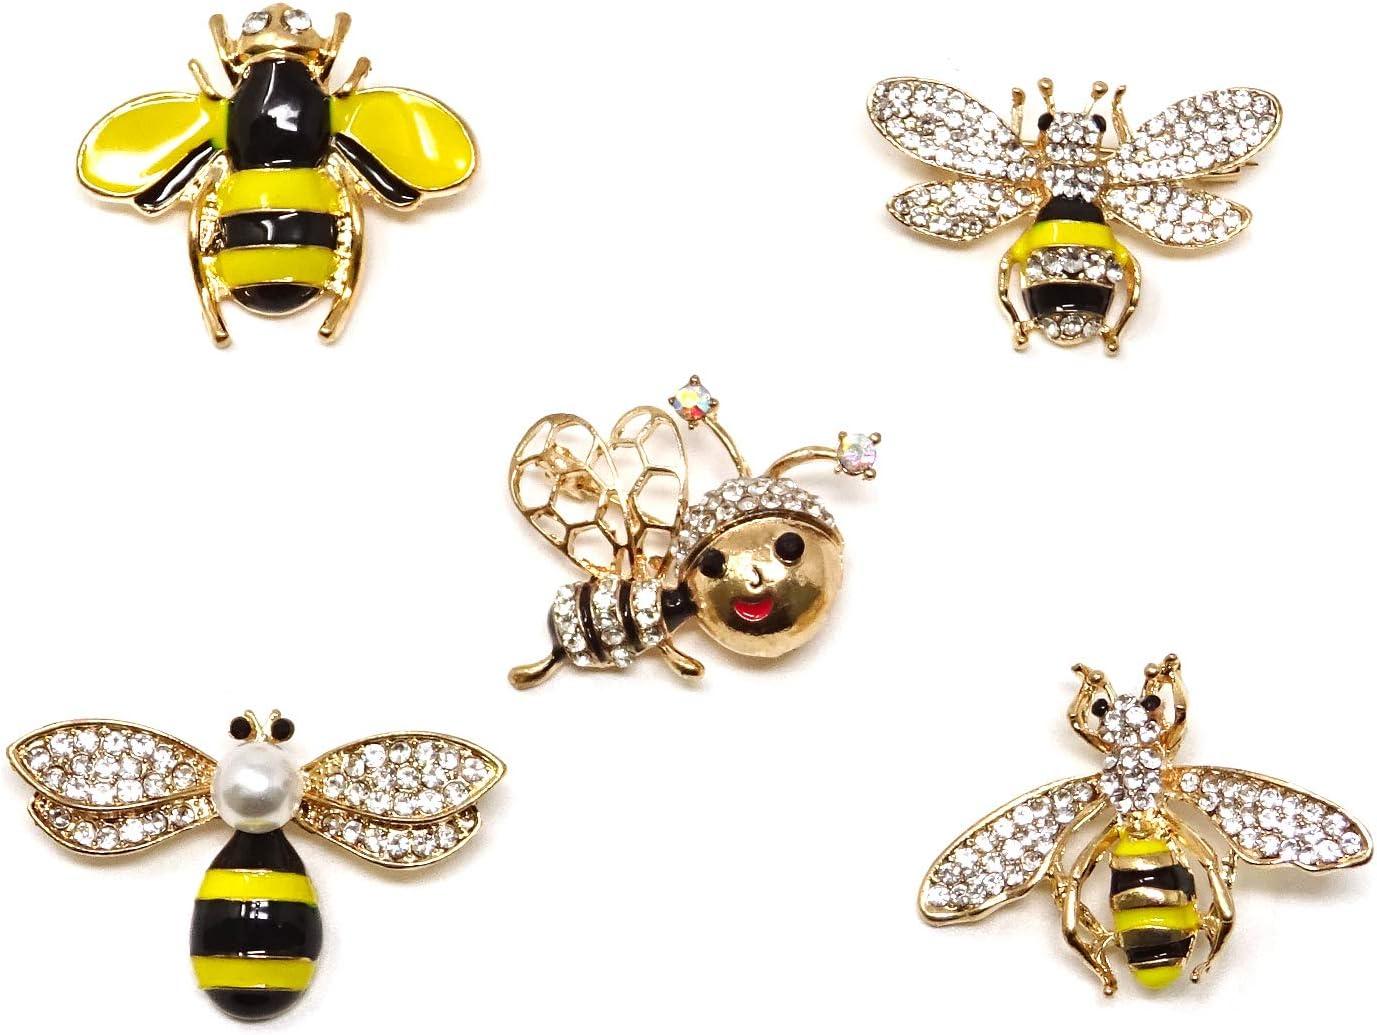 Honbay 5PCS Fashion Cute Gold Tone Enamel Honey Bee Brooch with Rhinestones for Collar, Dress, Sweater, Scarf, Shawl Decoration